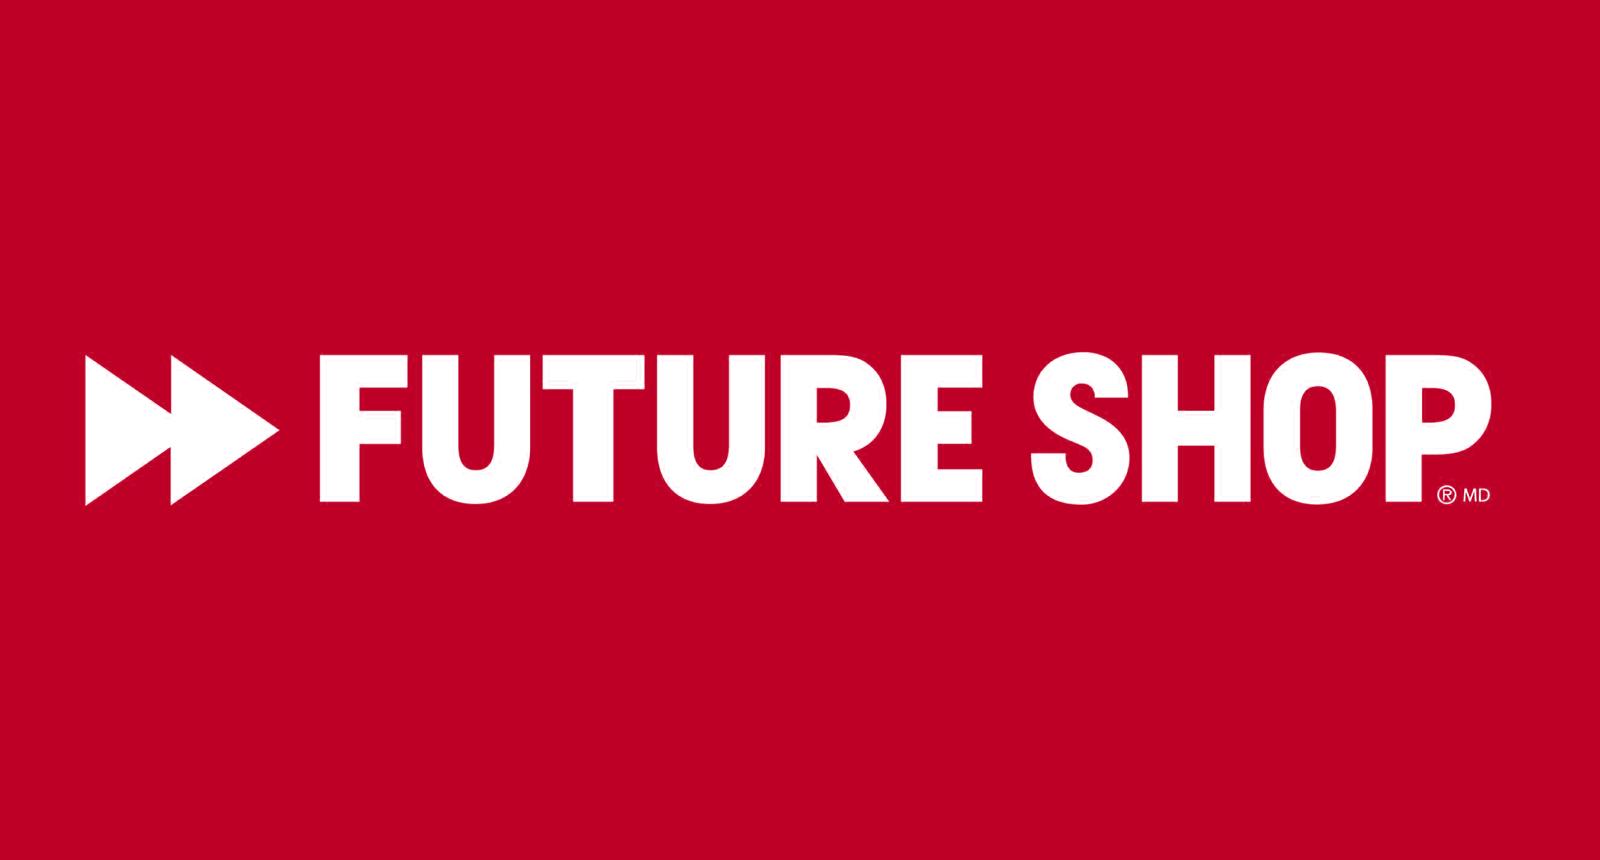 Ultimate Game Card Canada Future ShopDownload Free Software Programs Online - mmutorrent